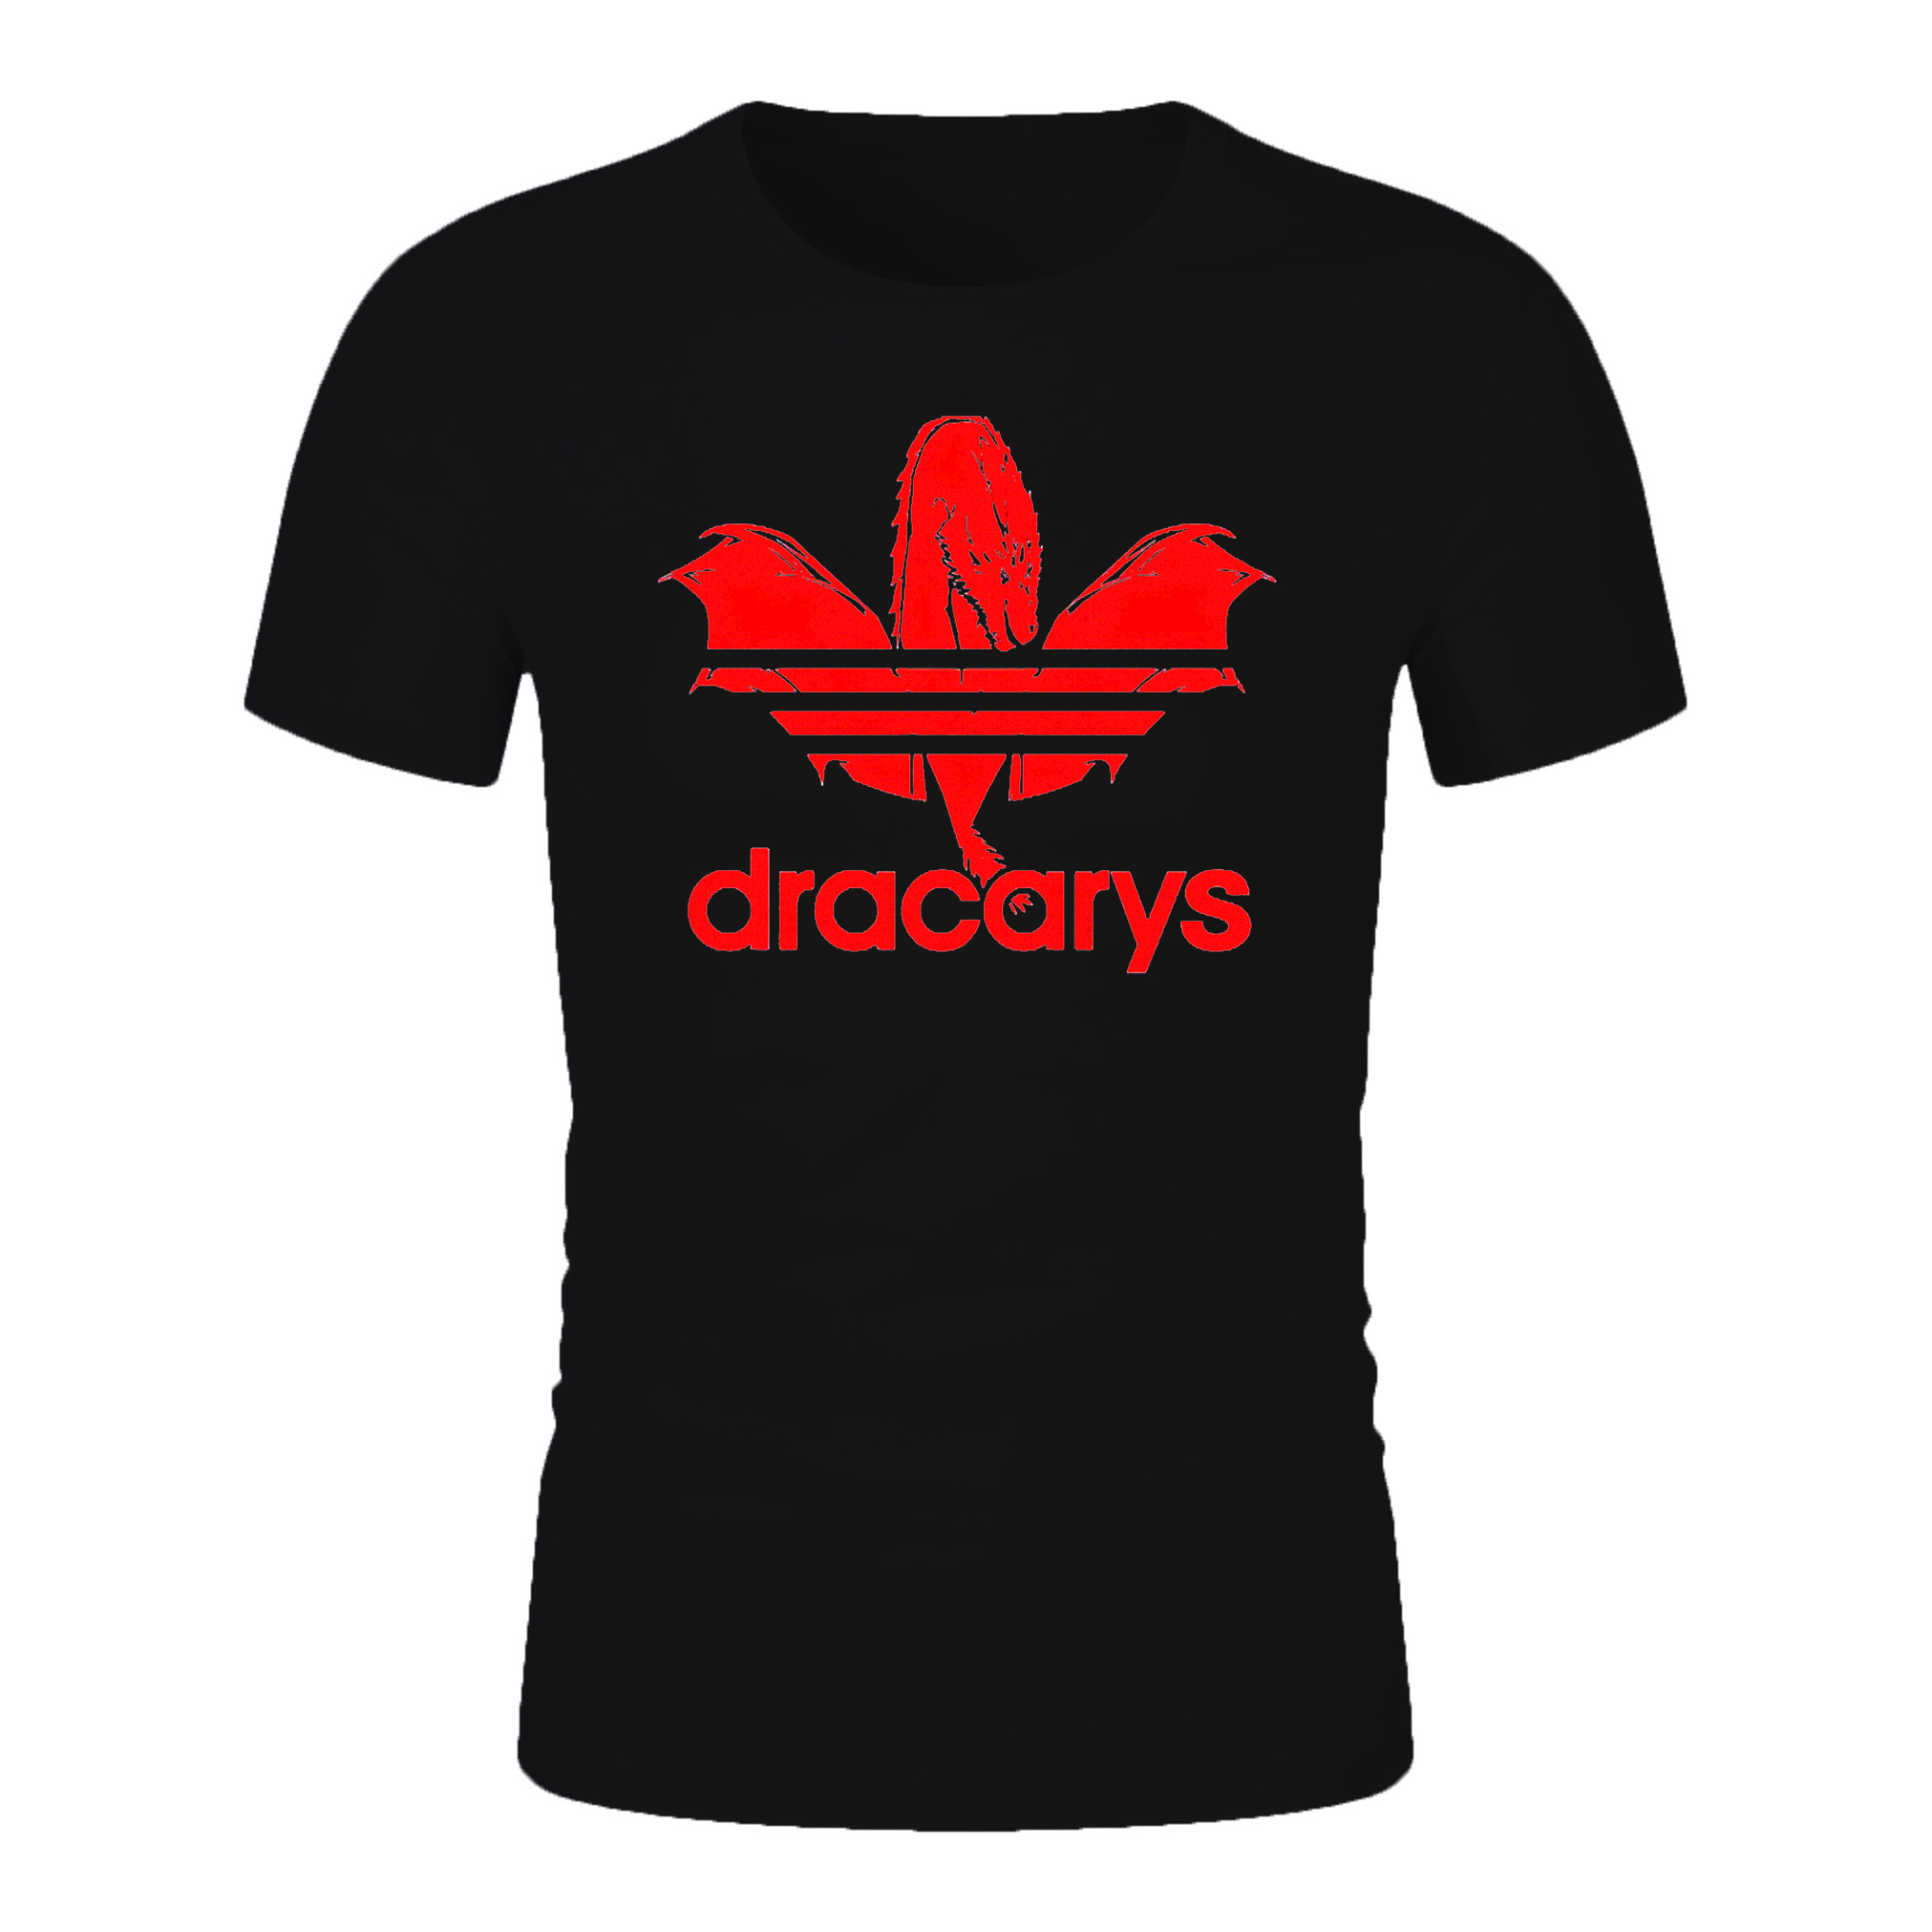 Camiseta Dracarys TEM Marca camisa Jogo De camisa Tronos t harajuku Do Vintage T shirt Camiseta hombre Homens Tshirt Mulheres Dracarys camisa